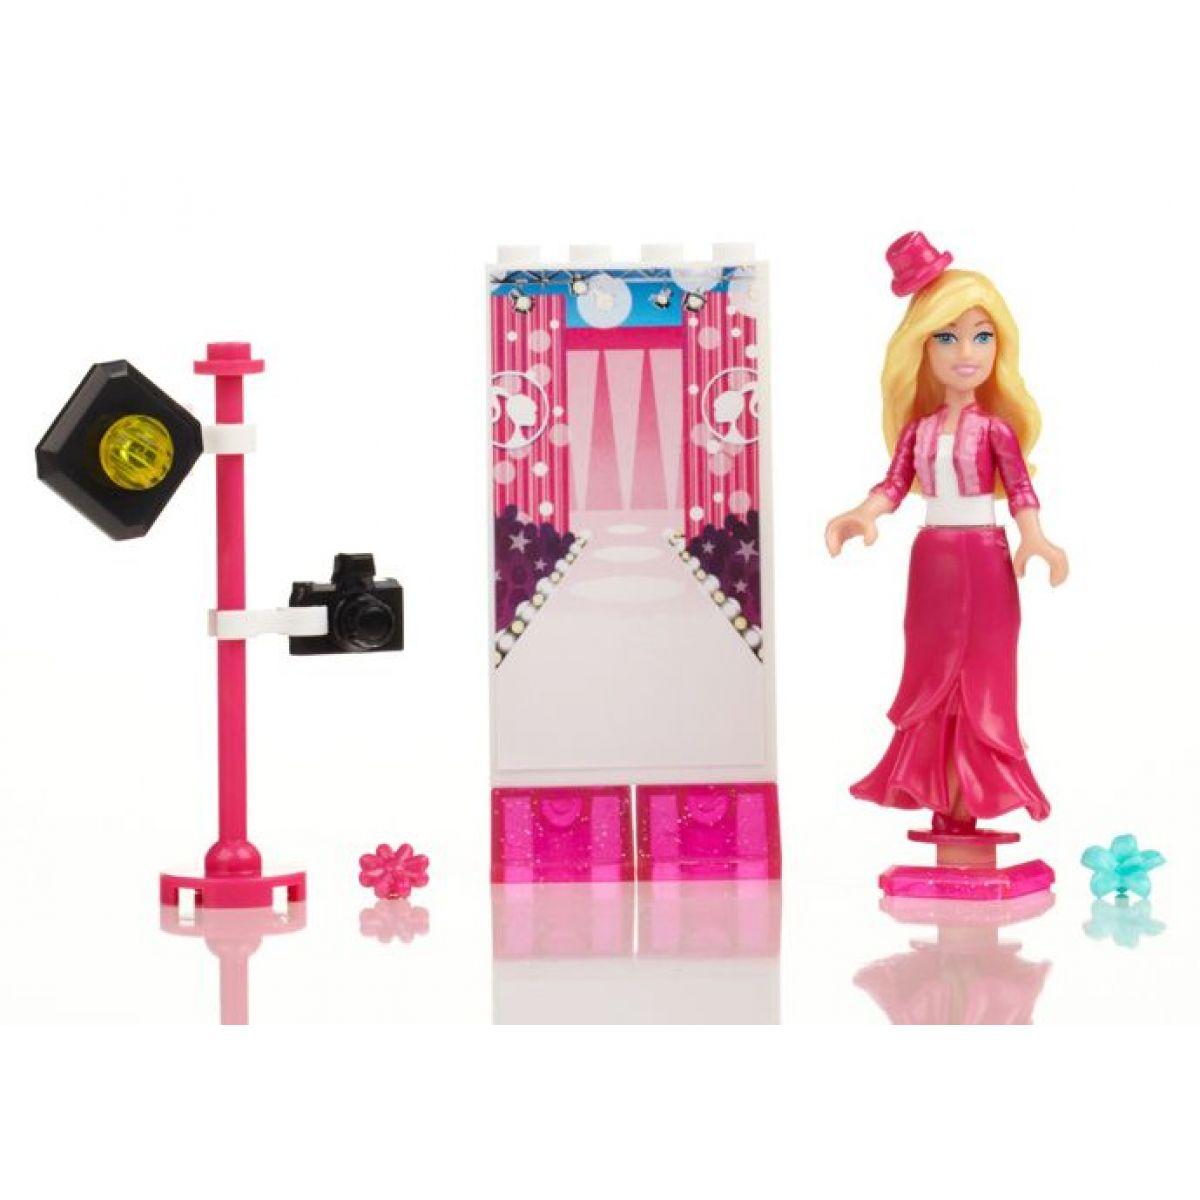 Megabloks Barbie figurky